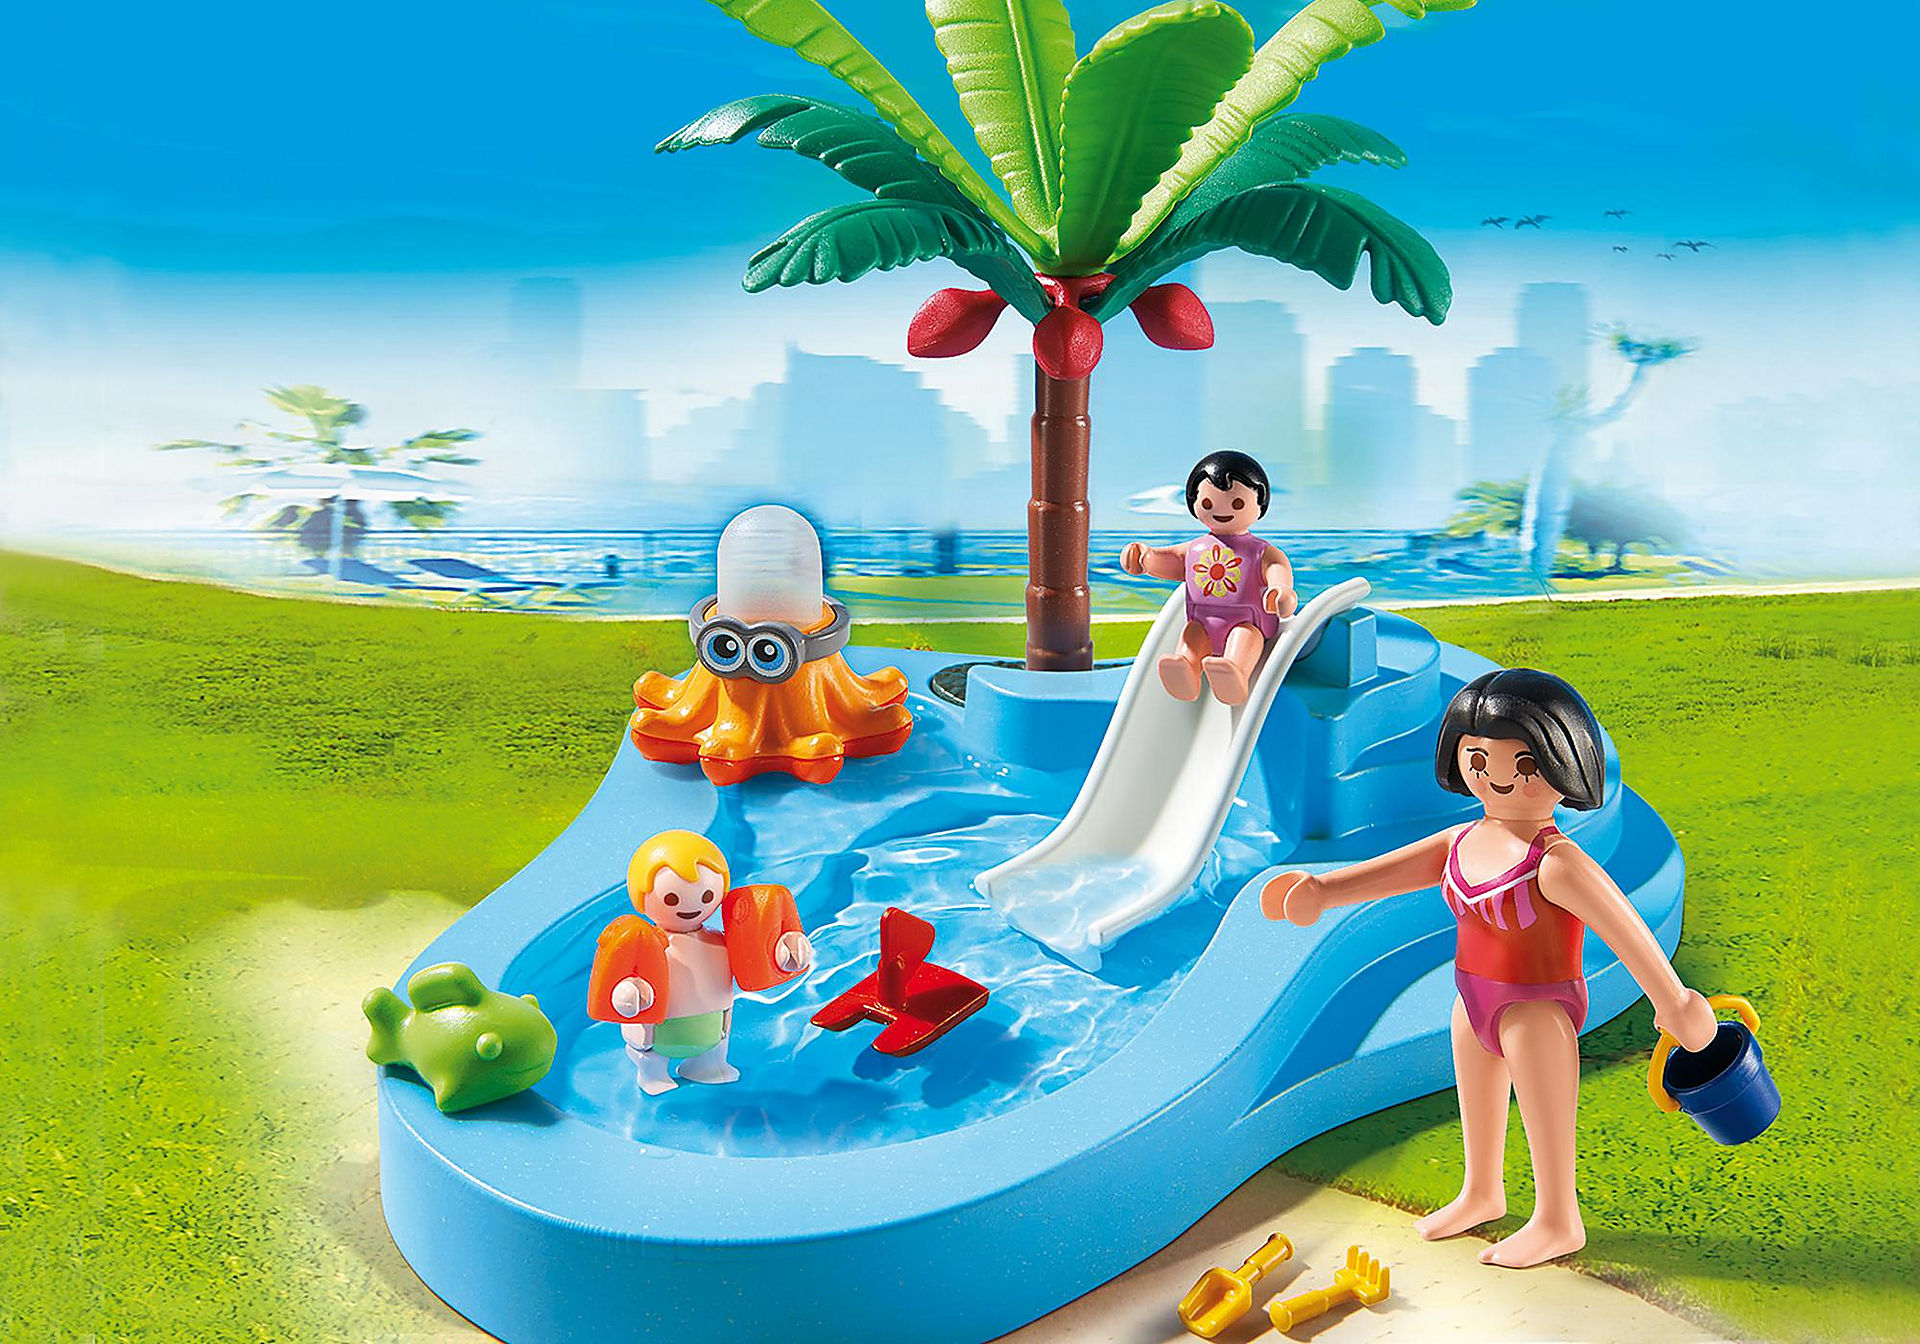 http://media.playmobil.com/i/playmobil/6673_product_detail/Πισίνα για μωρά με τσουλήθρα